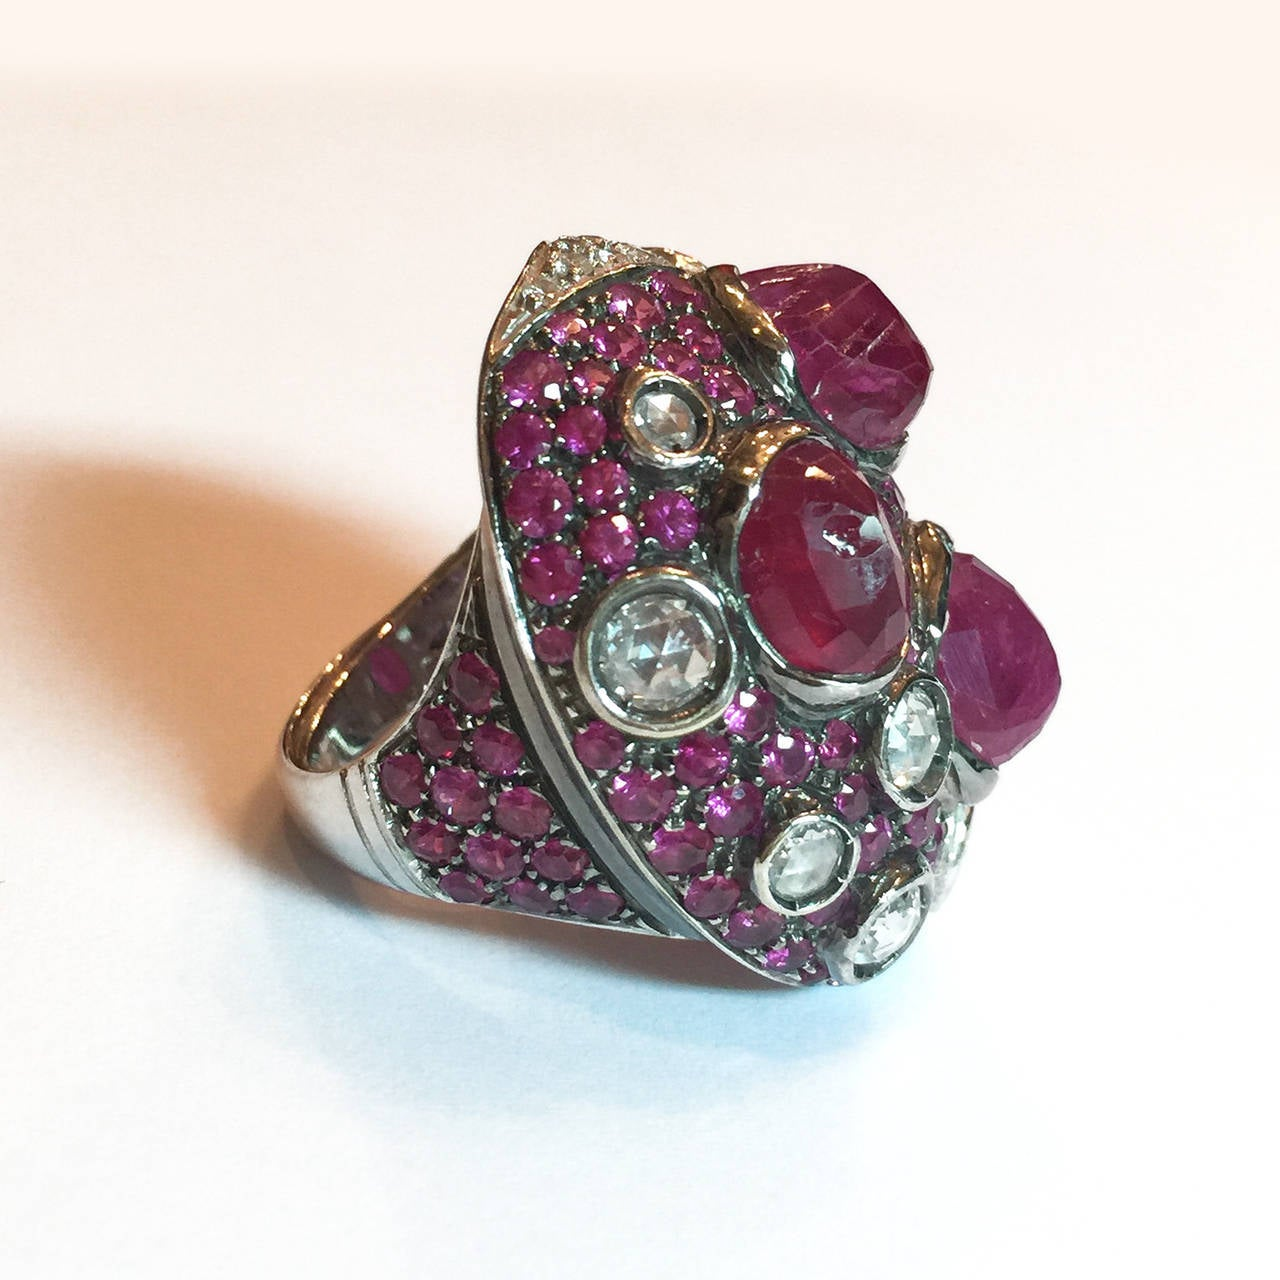 Repossi Ring Price